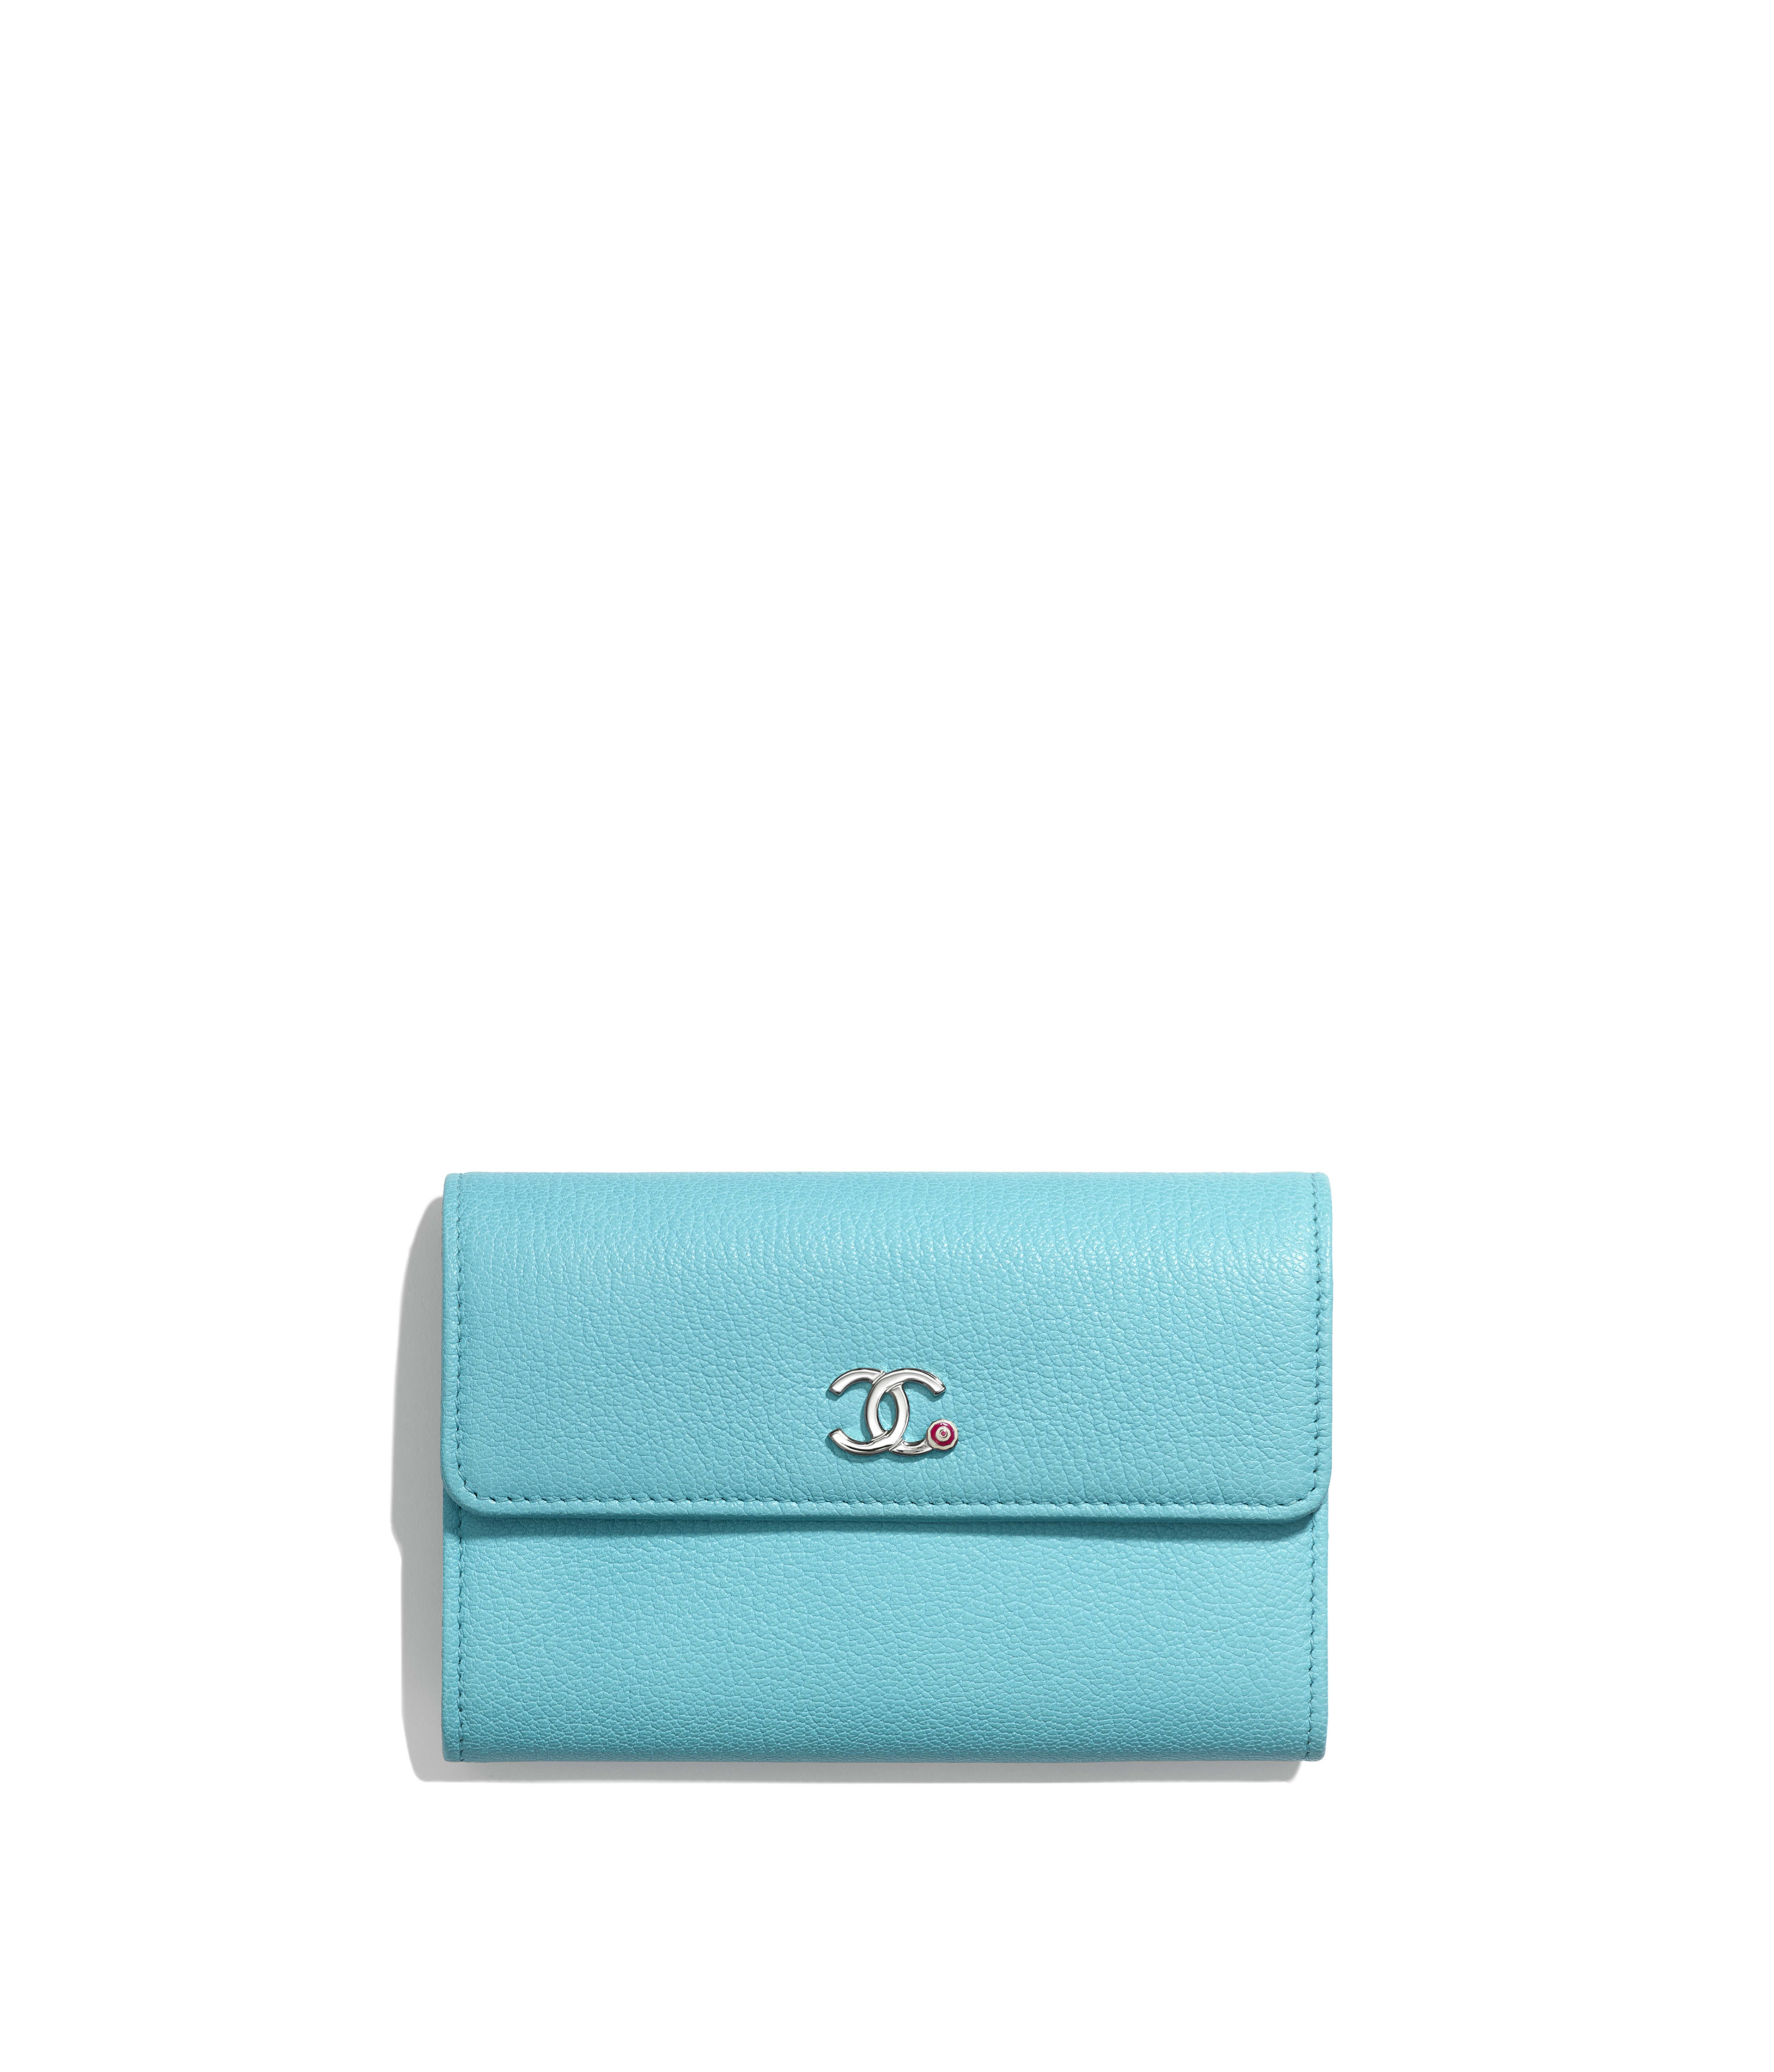 498a3fe486f2 Flap Wallet Goatskin & Silver-Tone Metal, Turquoise Ref. AP0265B00322N4513